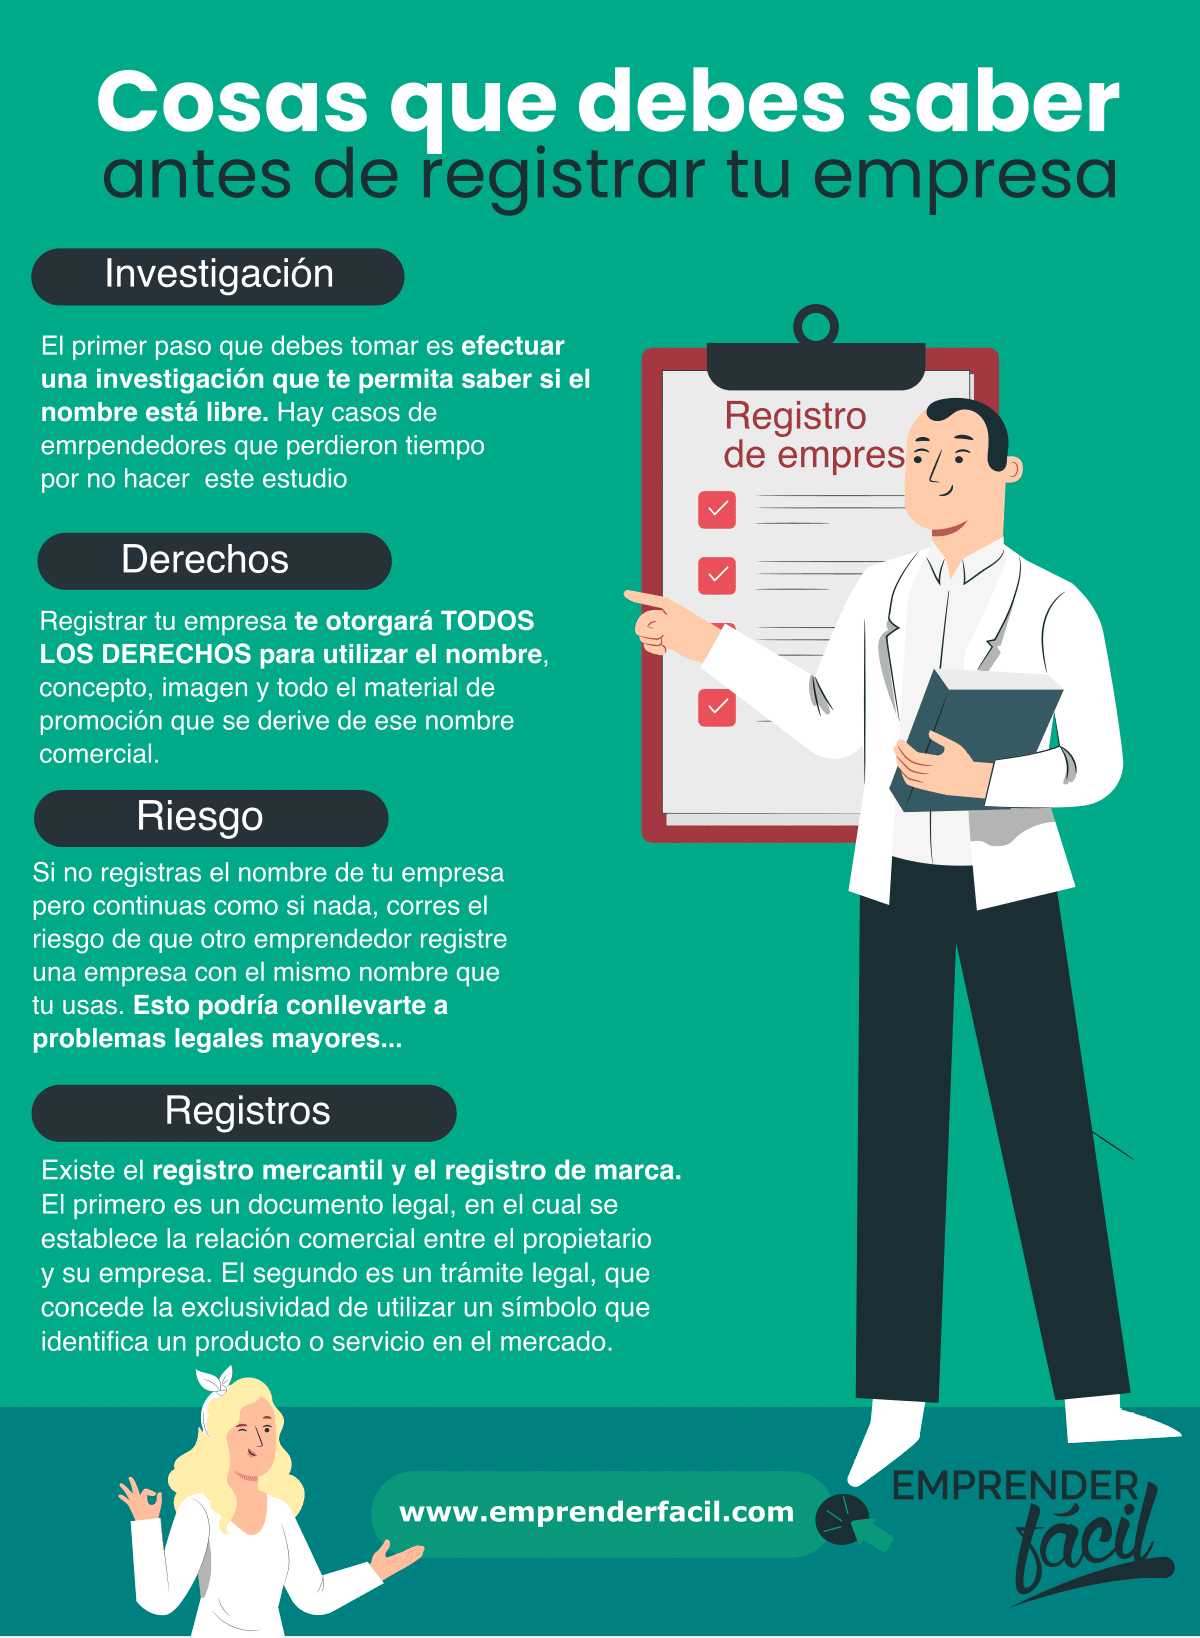 Cosas que debes saber antes de registrar tu empresa